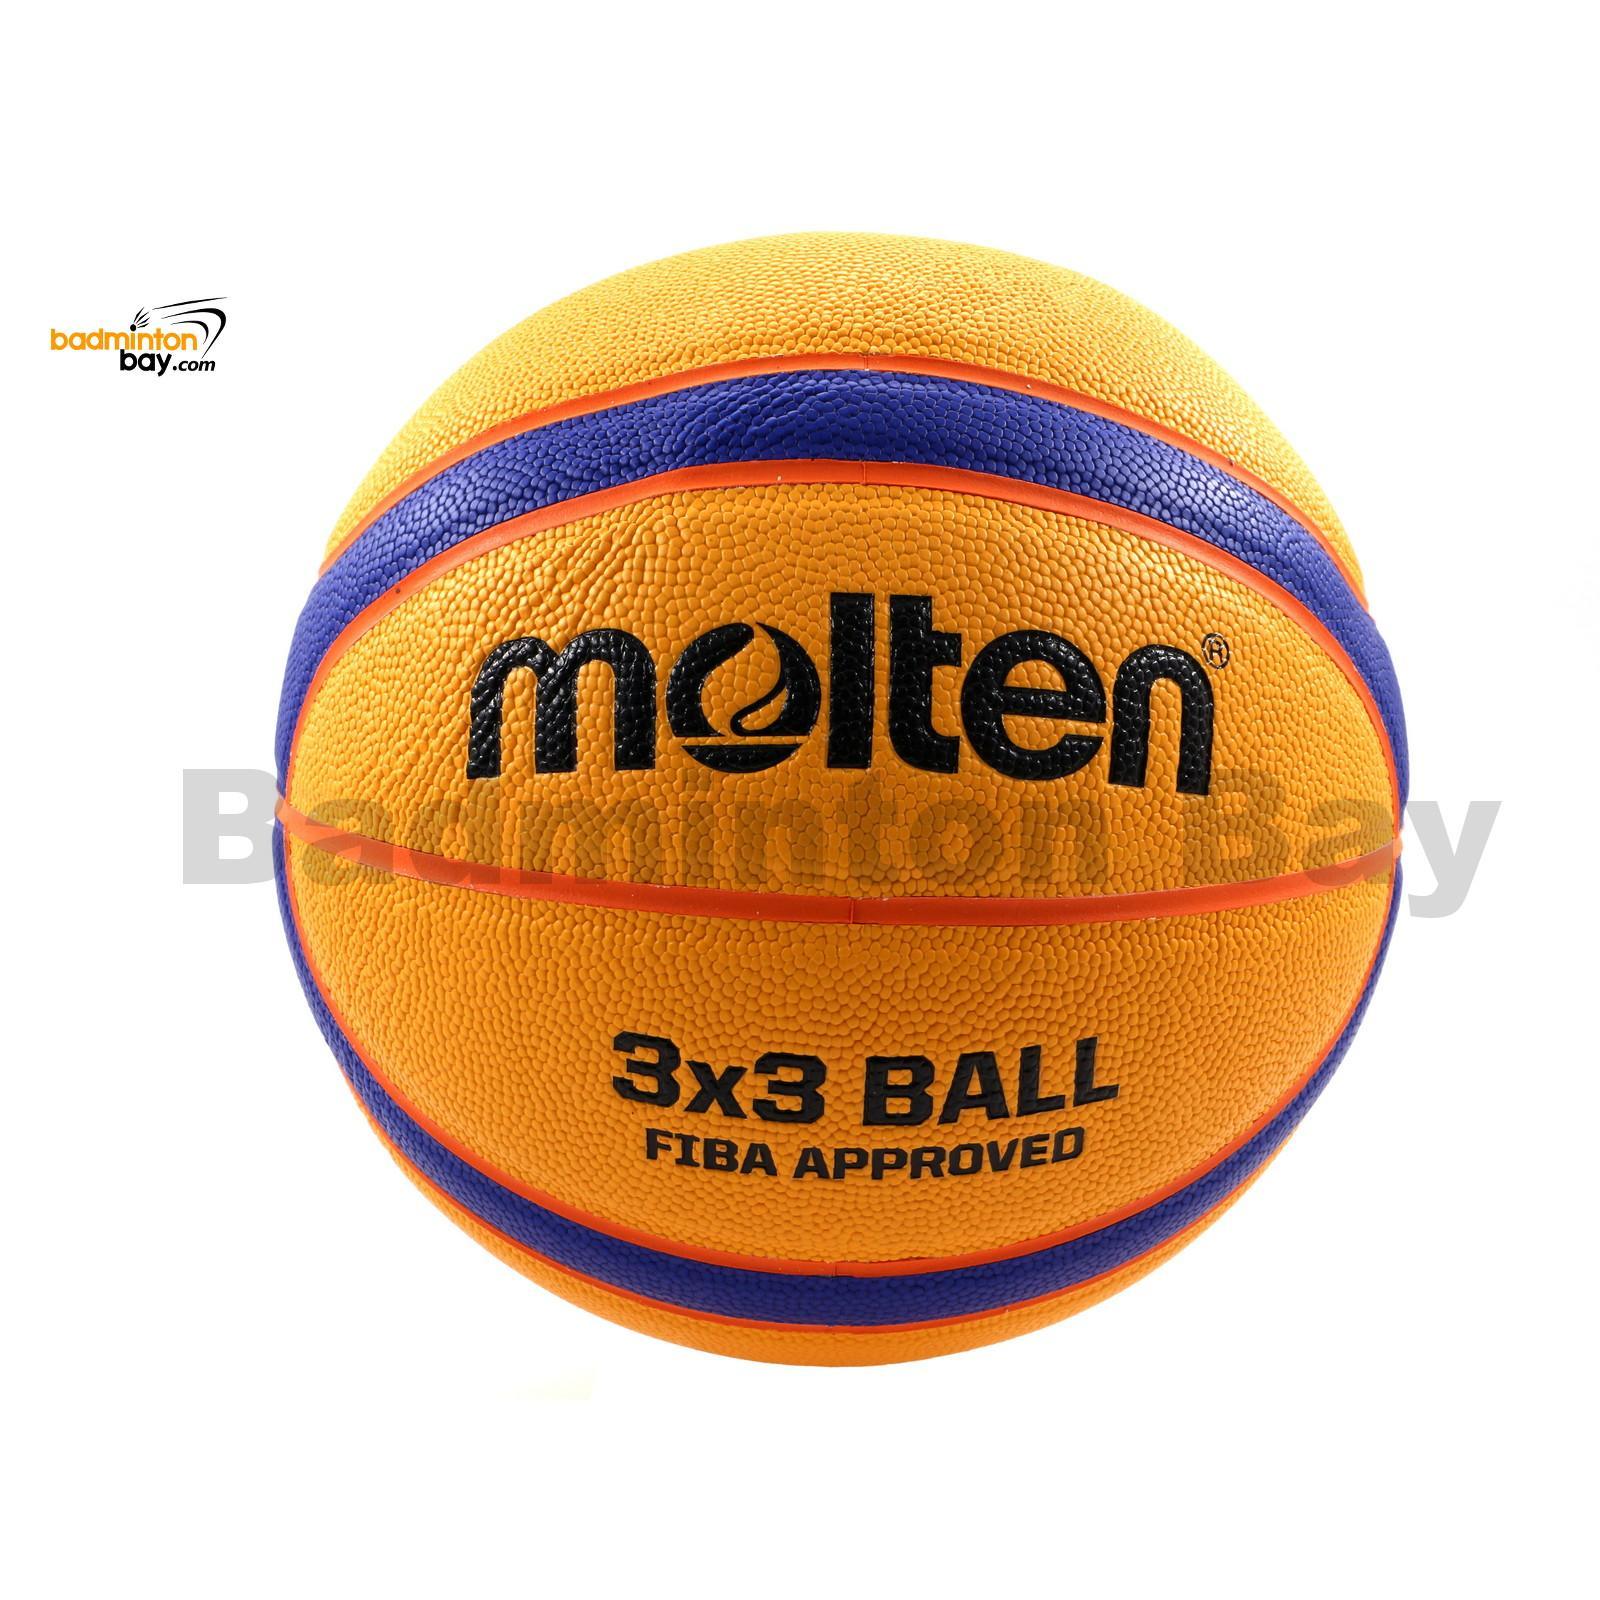 yellow//blue//orange 6 Molten Unisex Adult Basketball ball B33T5000 Fiba 3x3 Basketball Balls